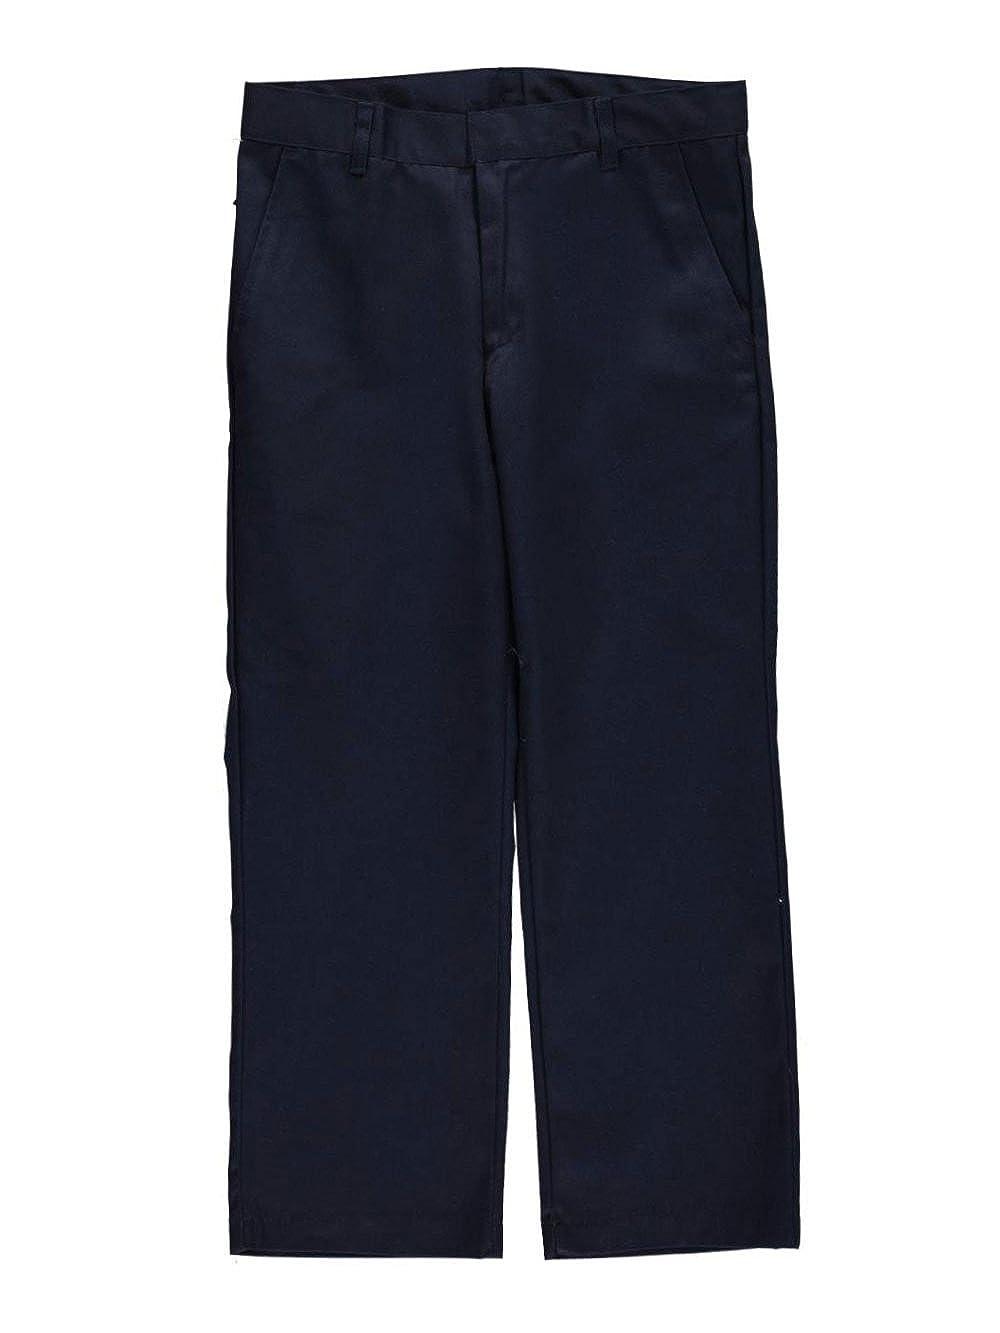 Galaxy School Uniforms Big Boys' Husky Double Knee Pleated Pants - navy, 18 husky